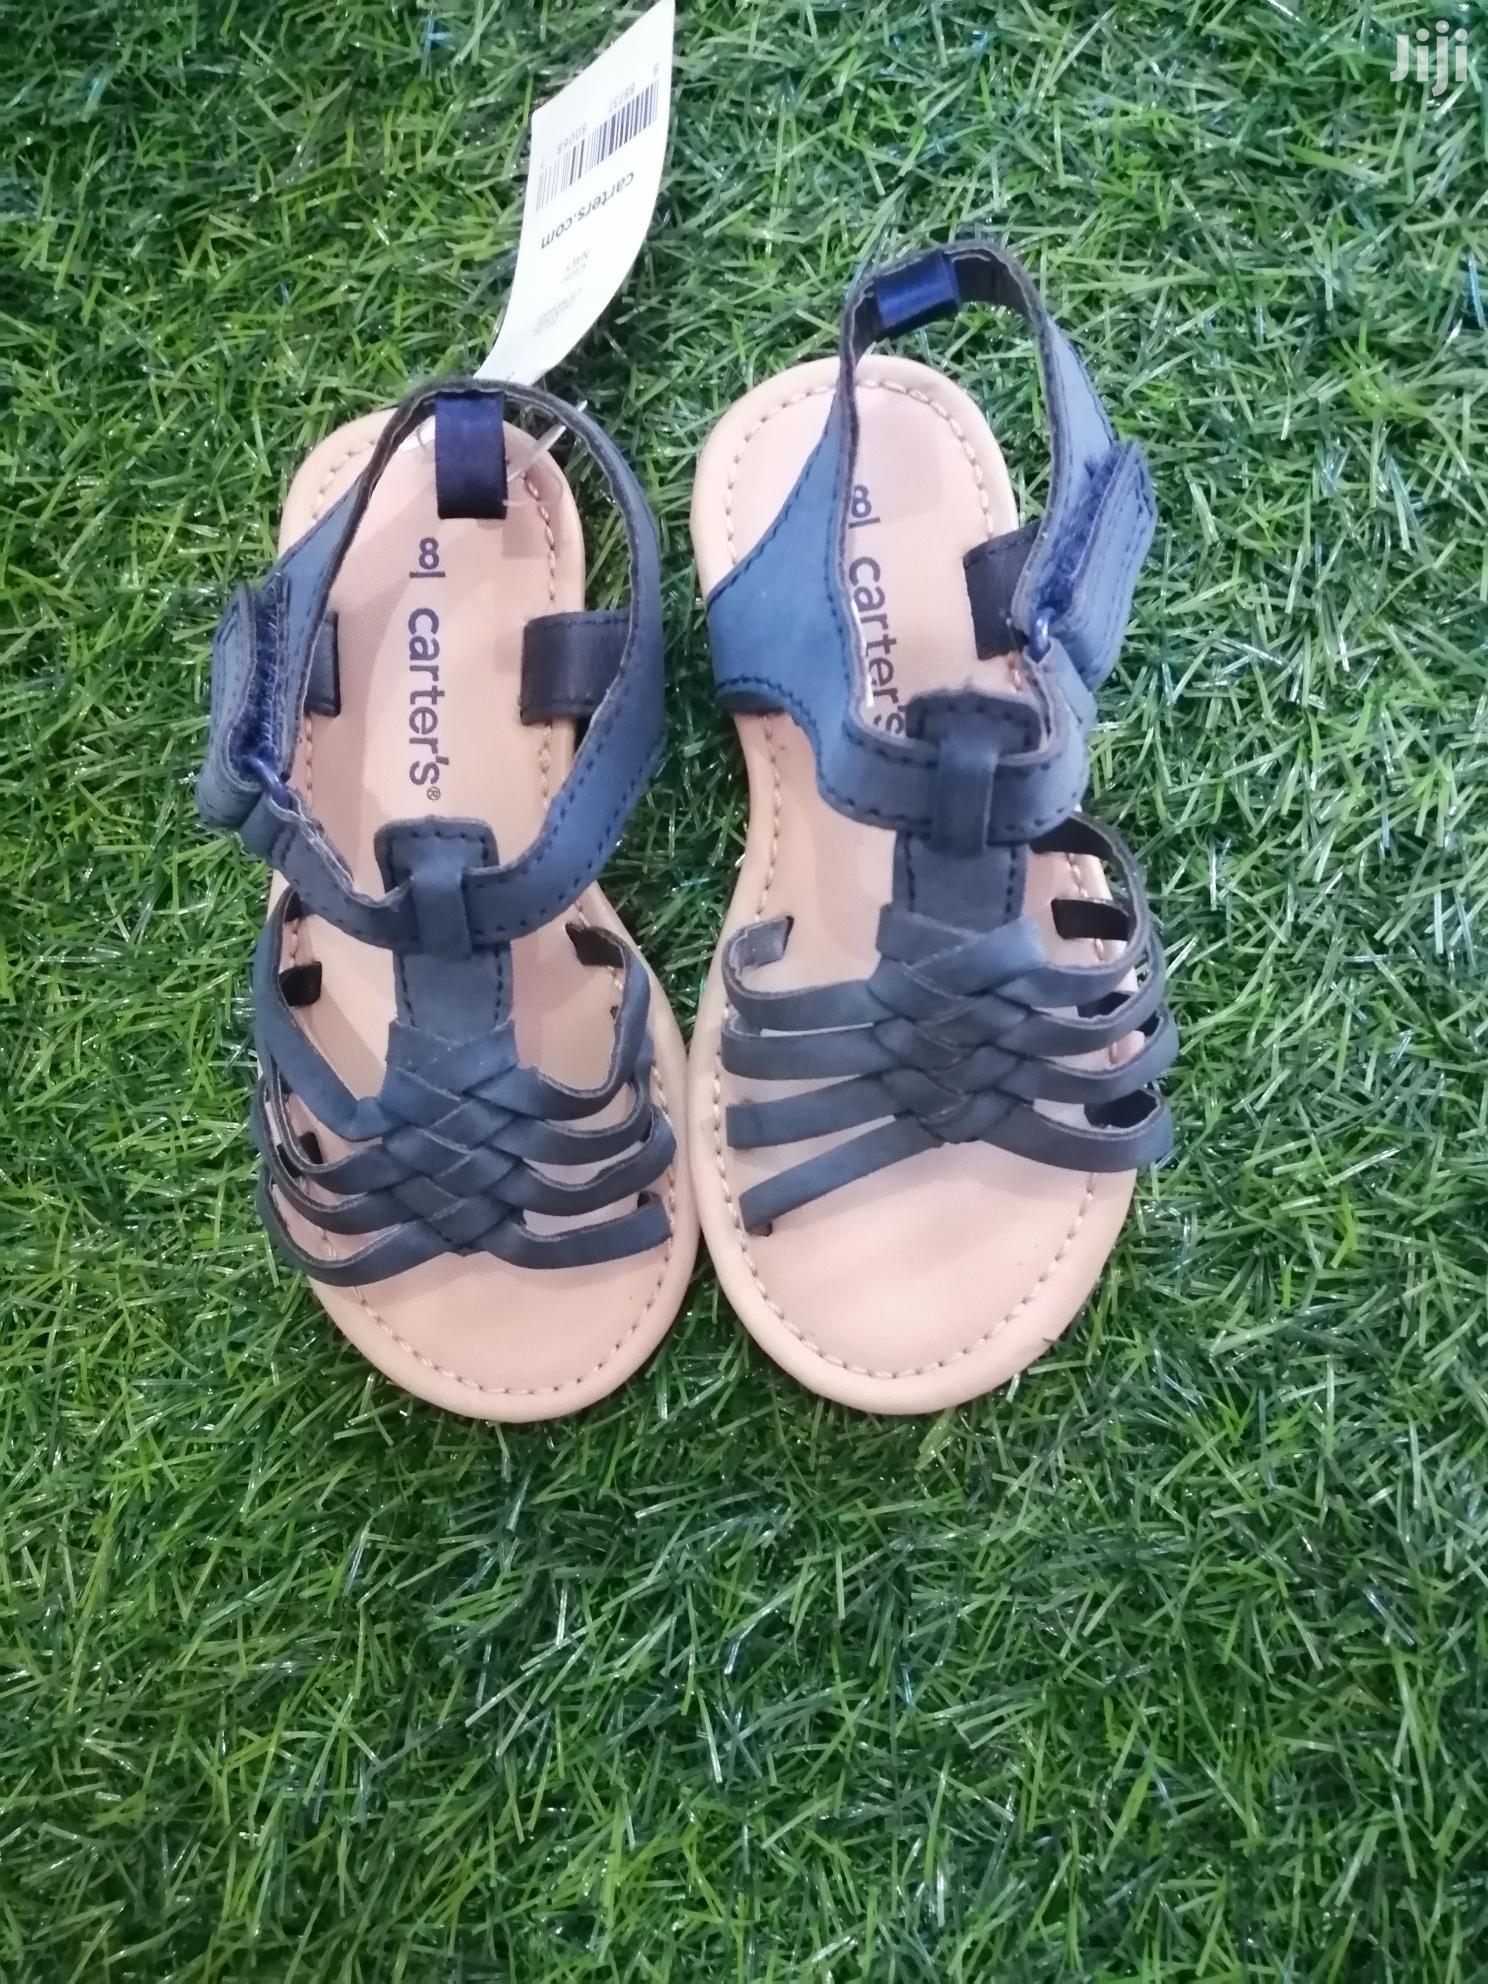 Carters Sandals Size 8/24